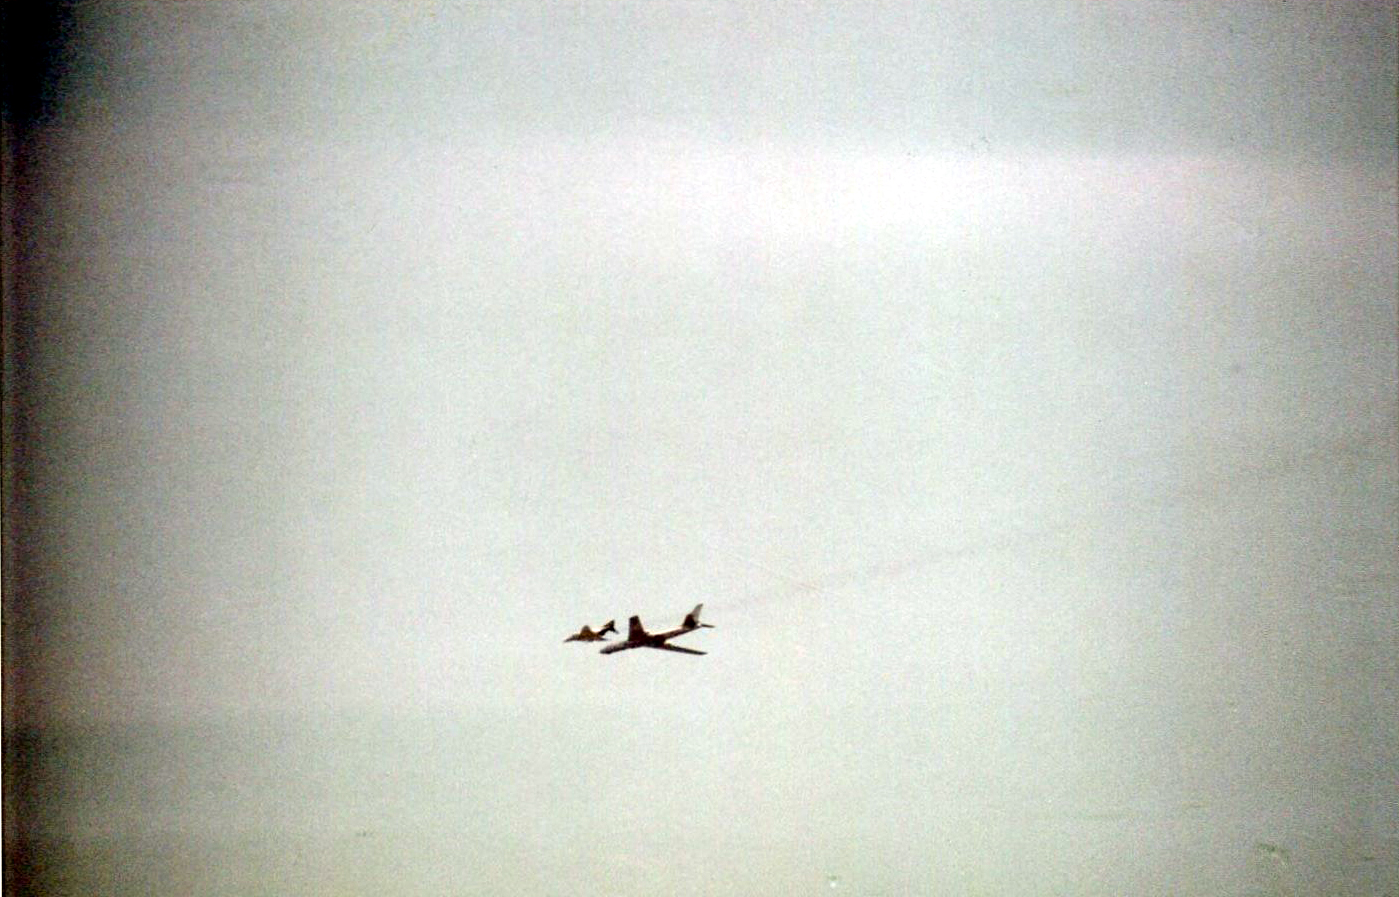 tu-16-badger-and-friend-l